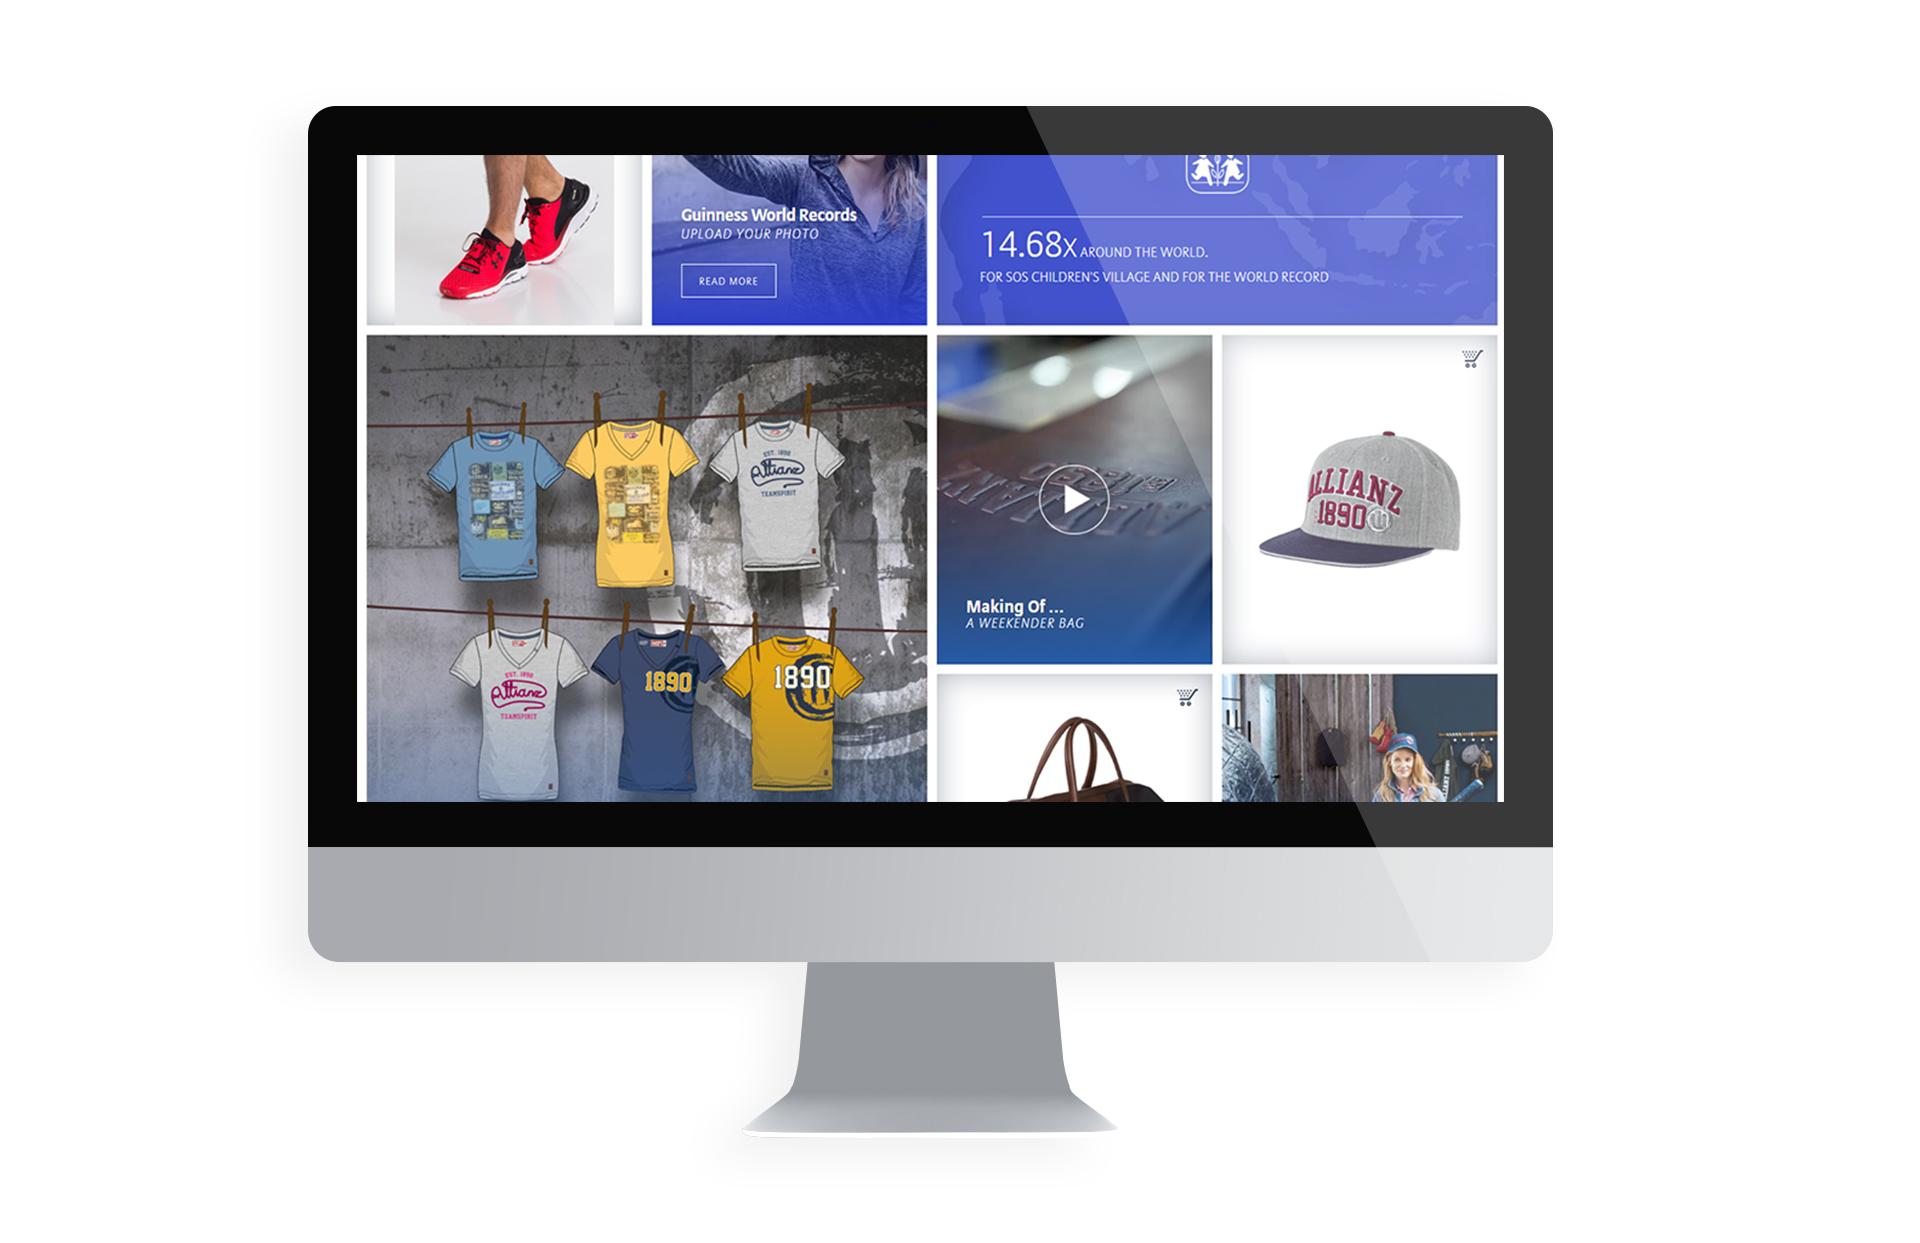 Allianz SE webdesign shop webshop ecommerce website design responsive LAKE5 Consulting GmbH Hannover Germany